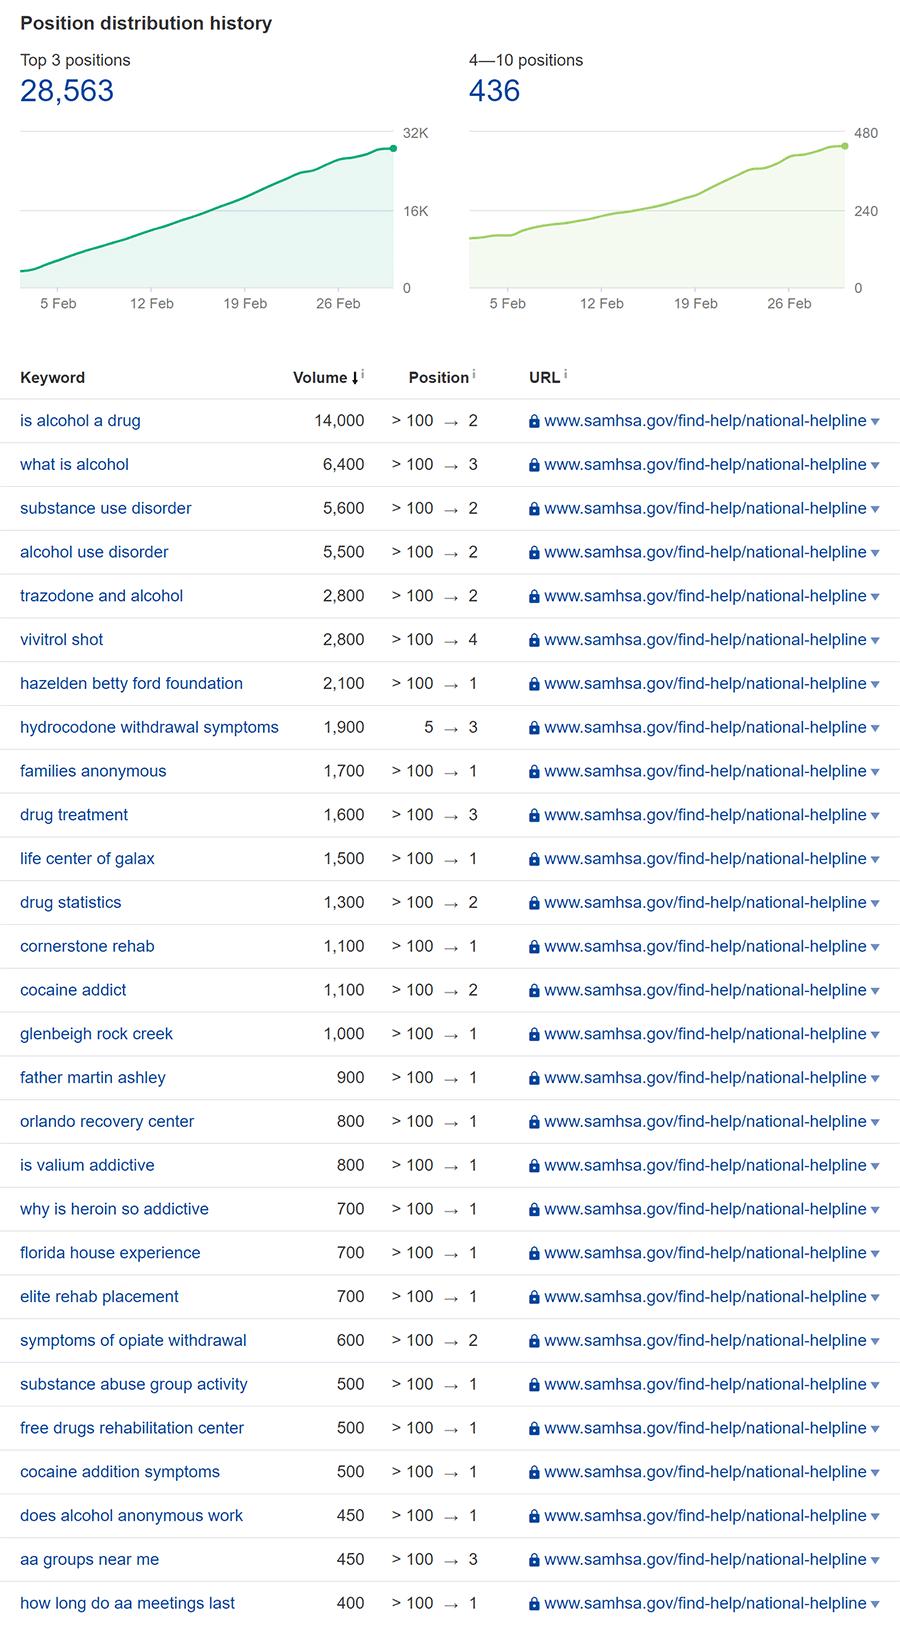 SAMHSA top 3 results